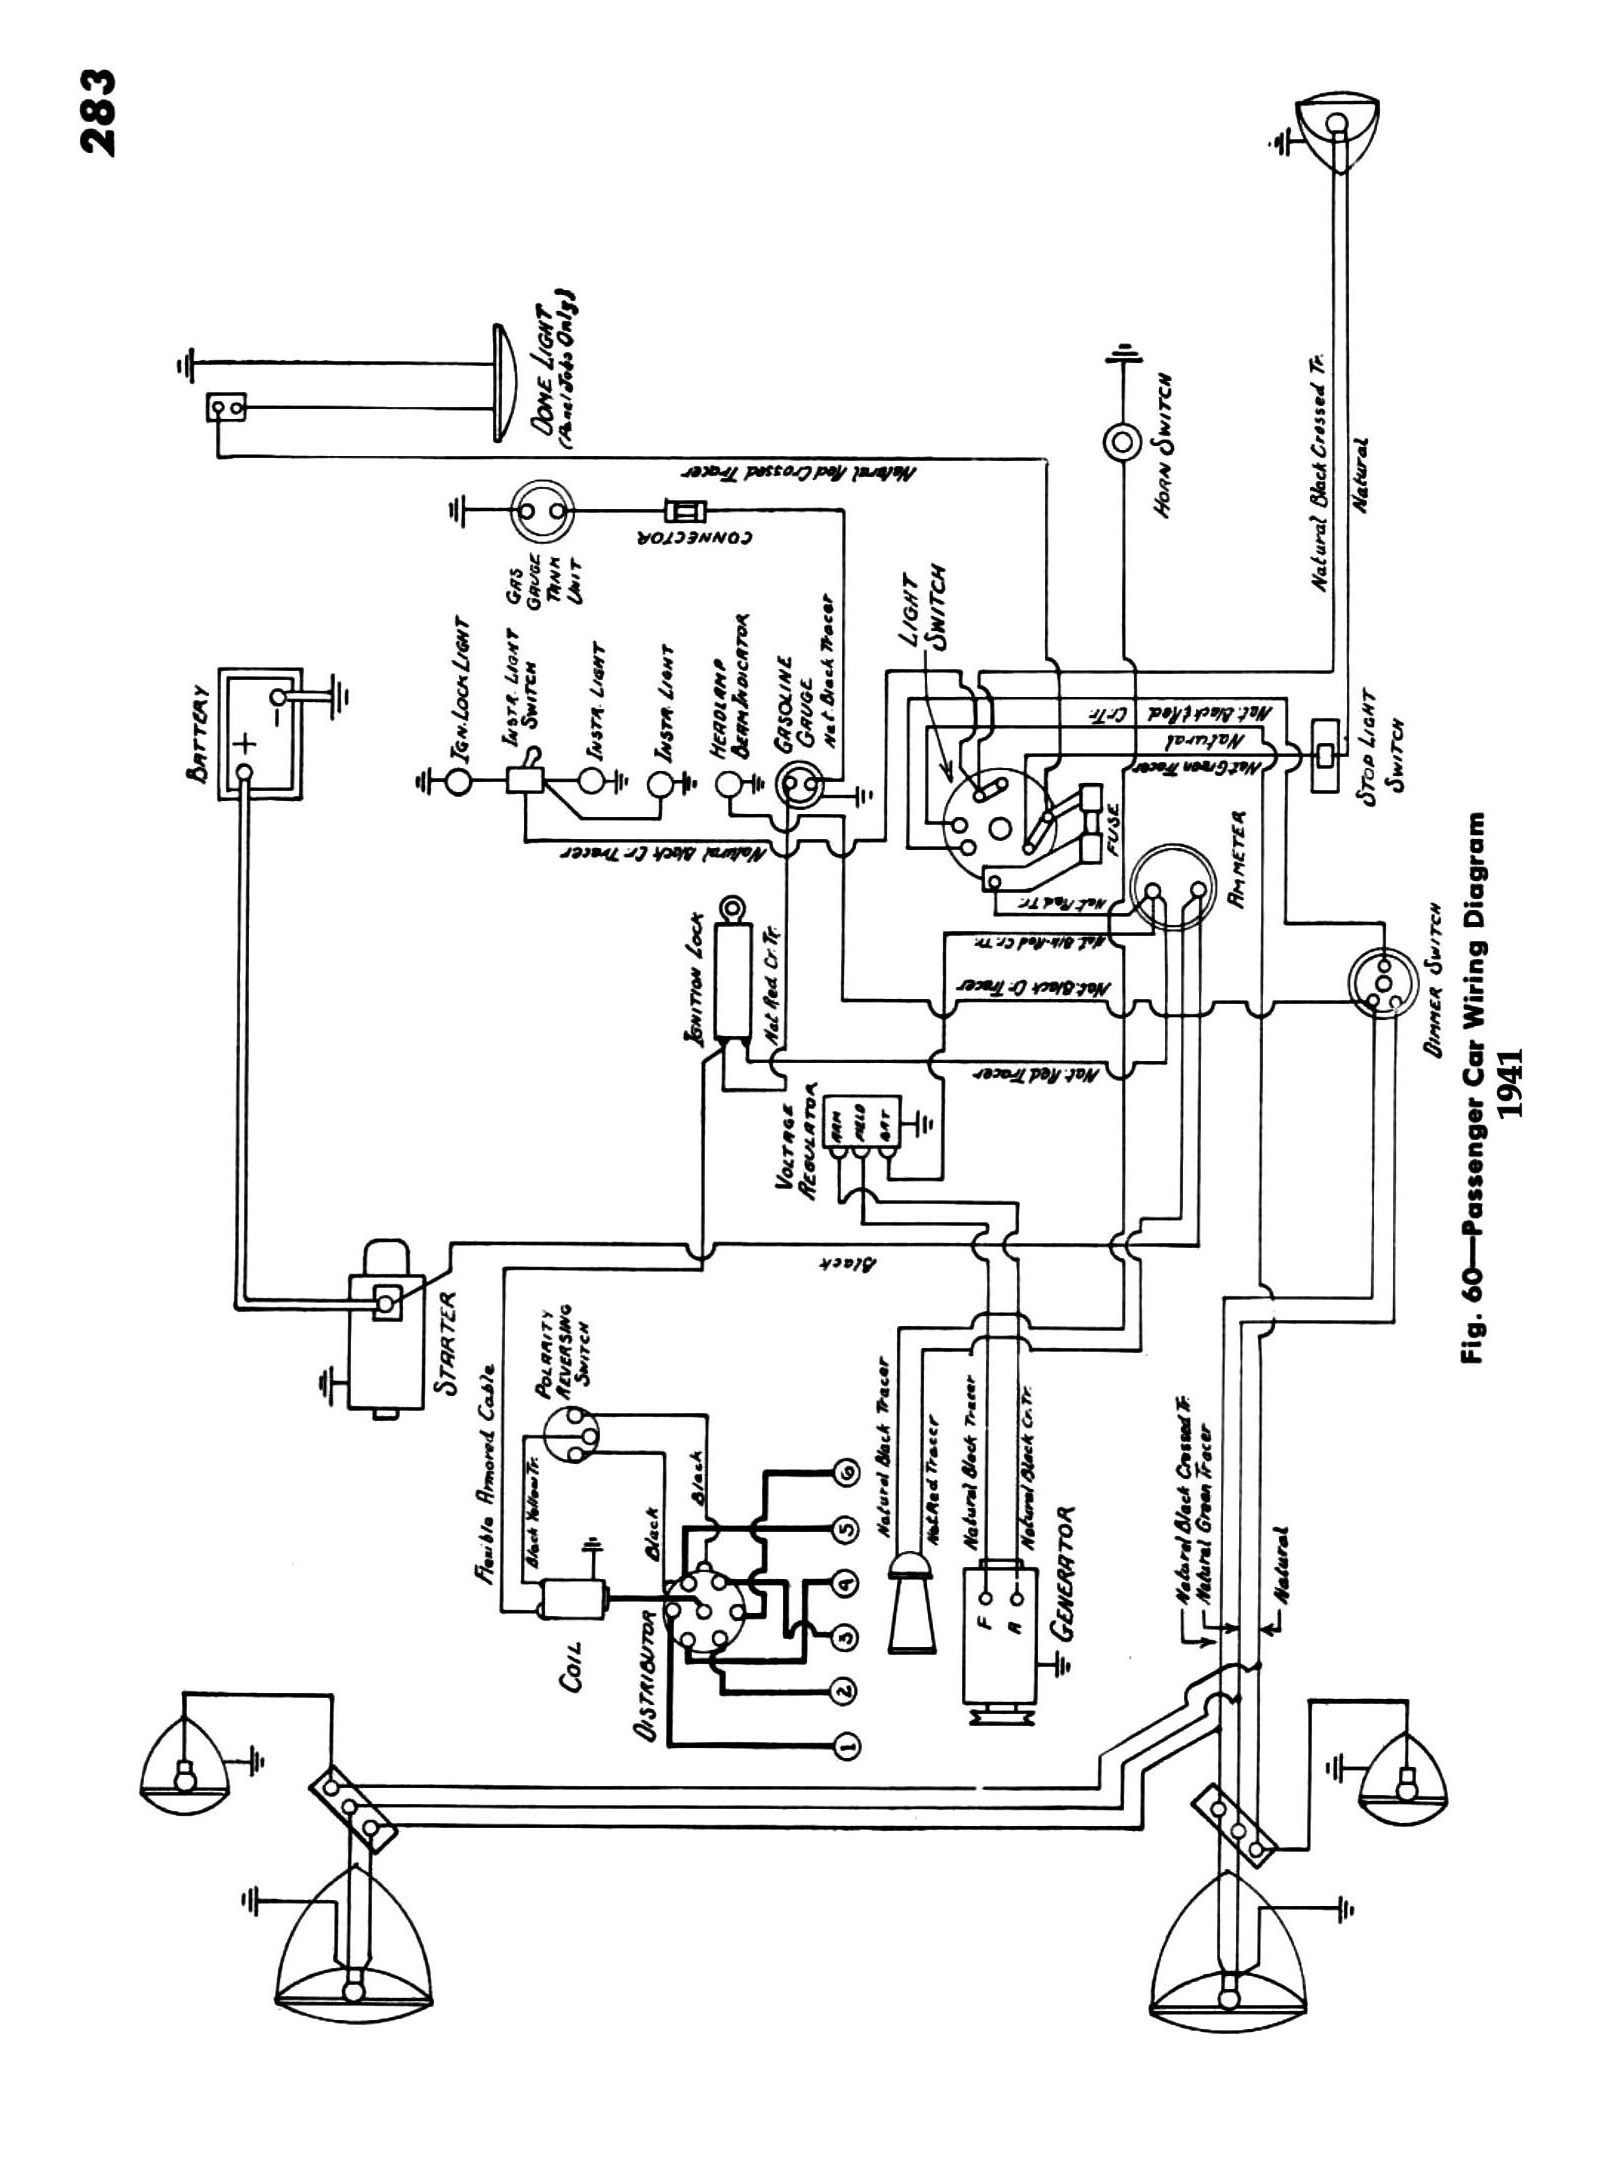 87 Chevy Truck Wiring Diagram Chevy Wiring Diagrams Of 87 Chevy Truck Wiring Diagram